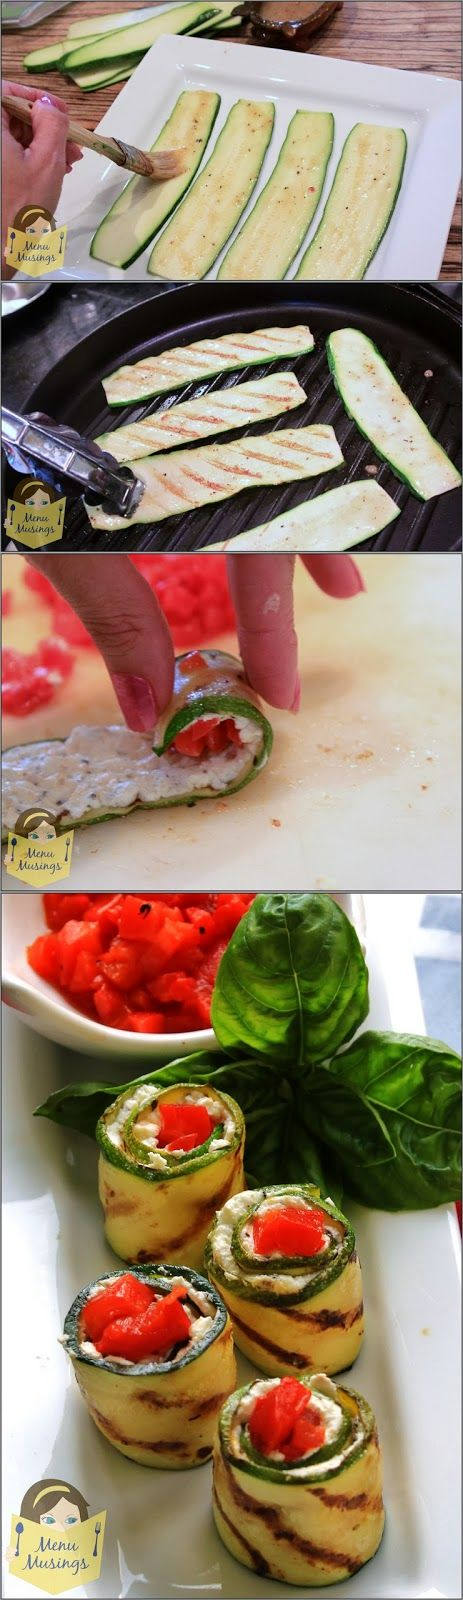 http://menumusings.blogspot.com/2013/08/grilled-zucchini-rolls.html